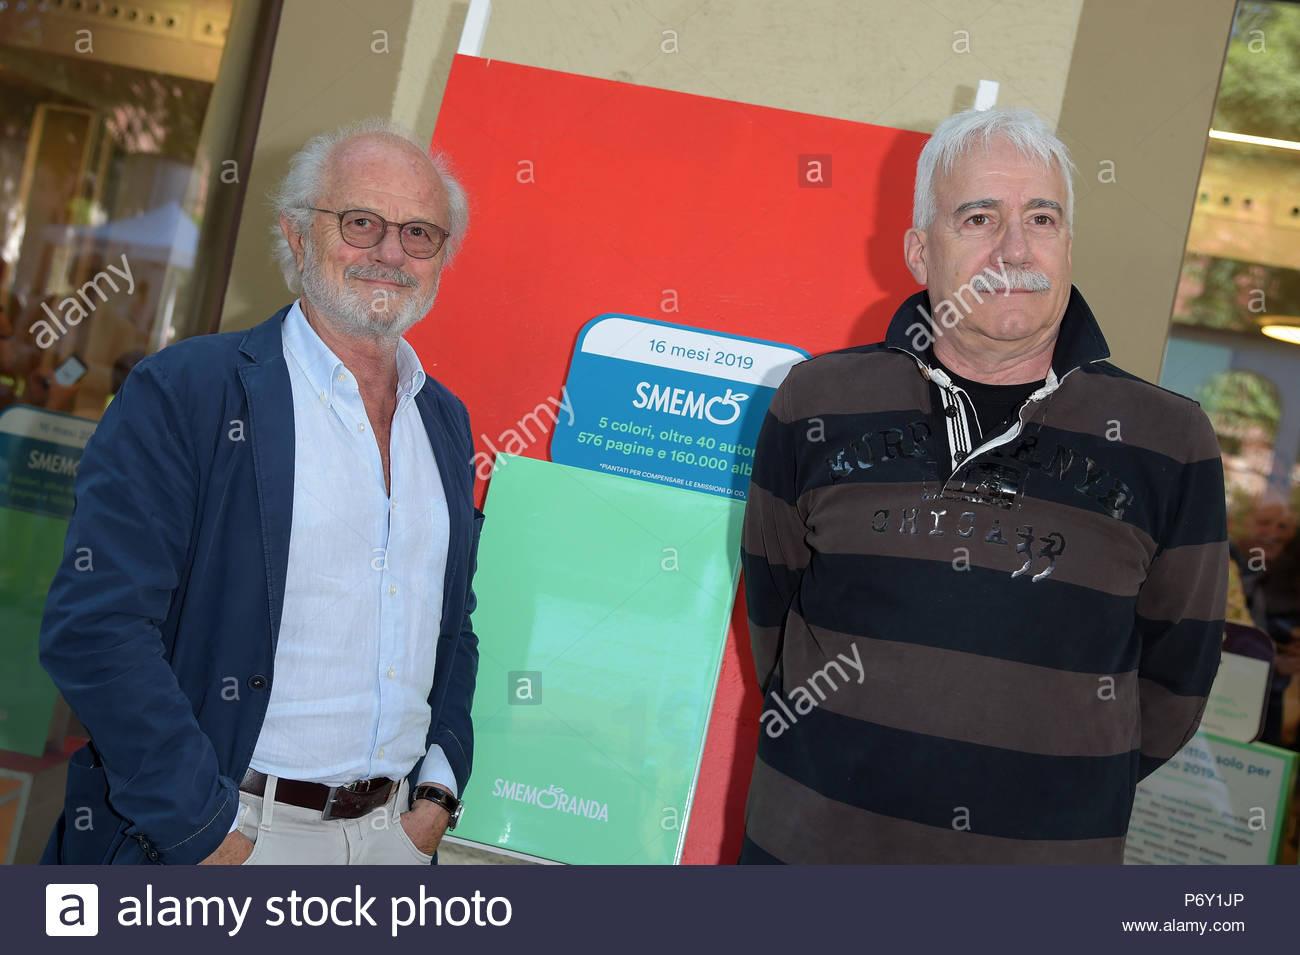 Gino & Michele milano 12-06-2018 - Stock Image